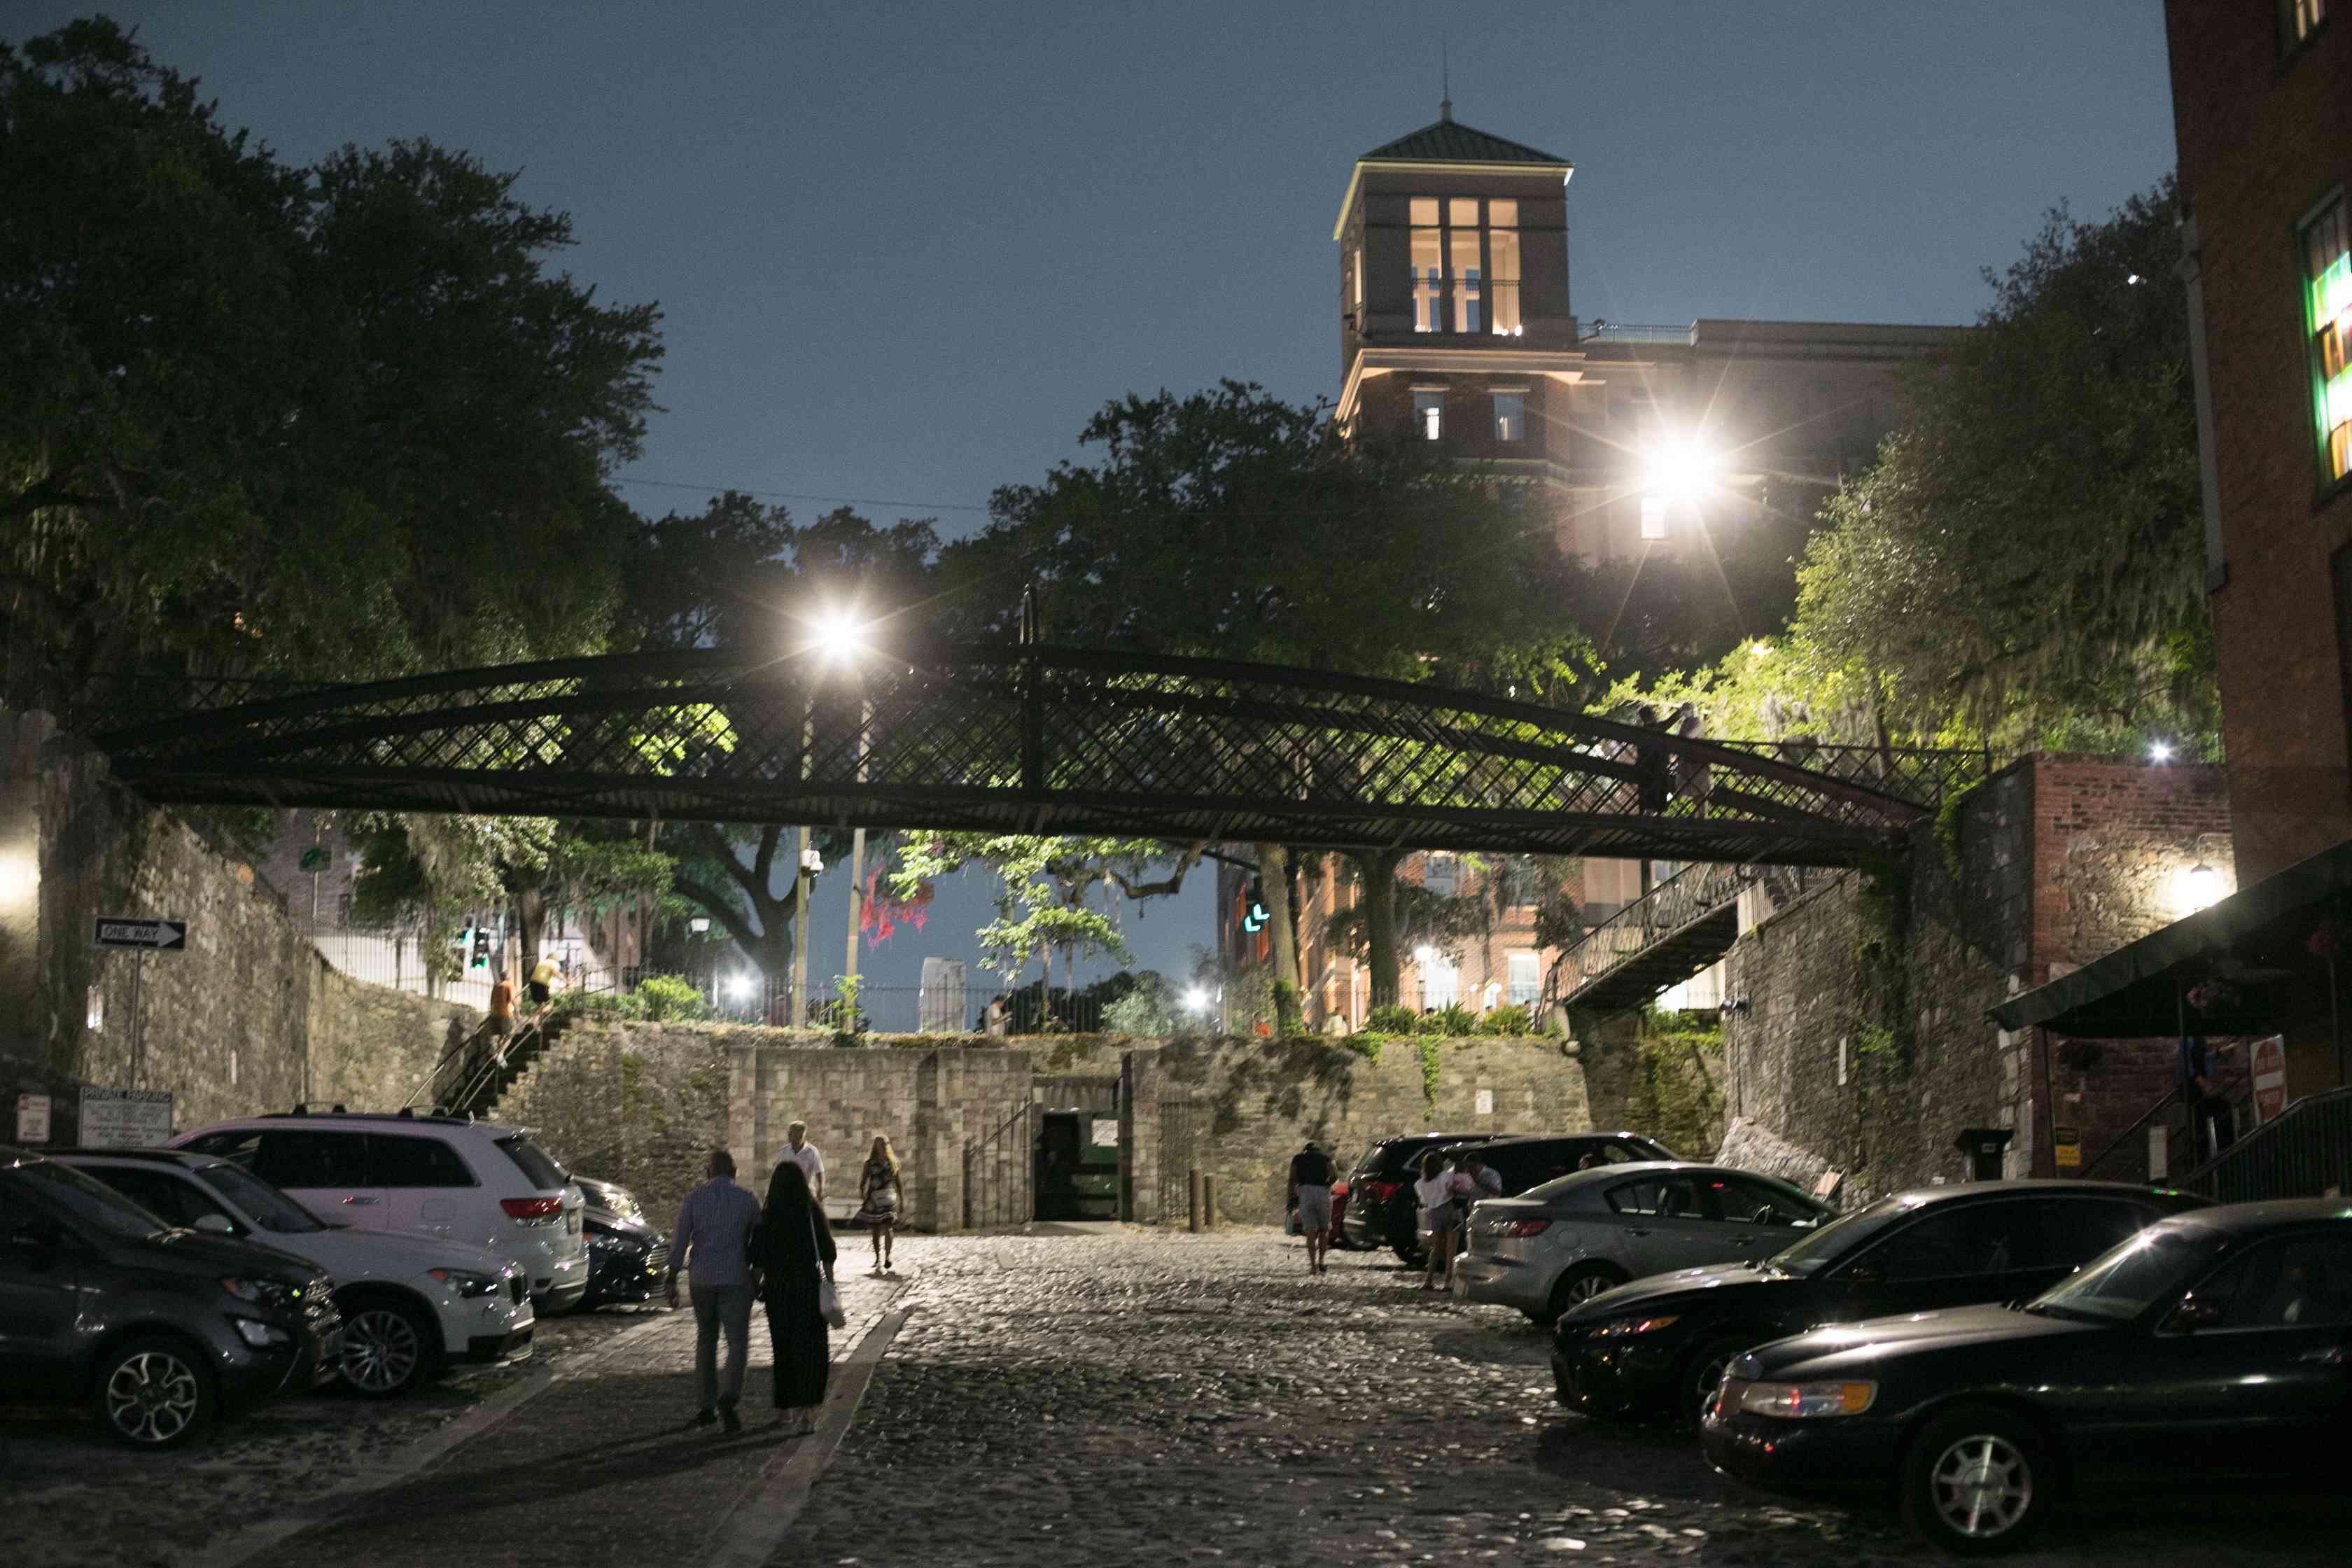 River Street at Night in Savannah, GA